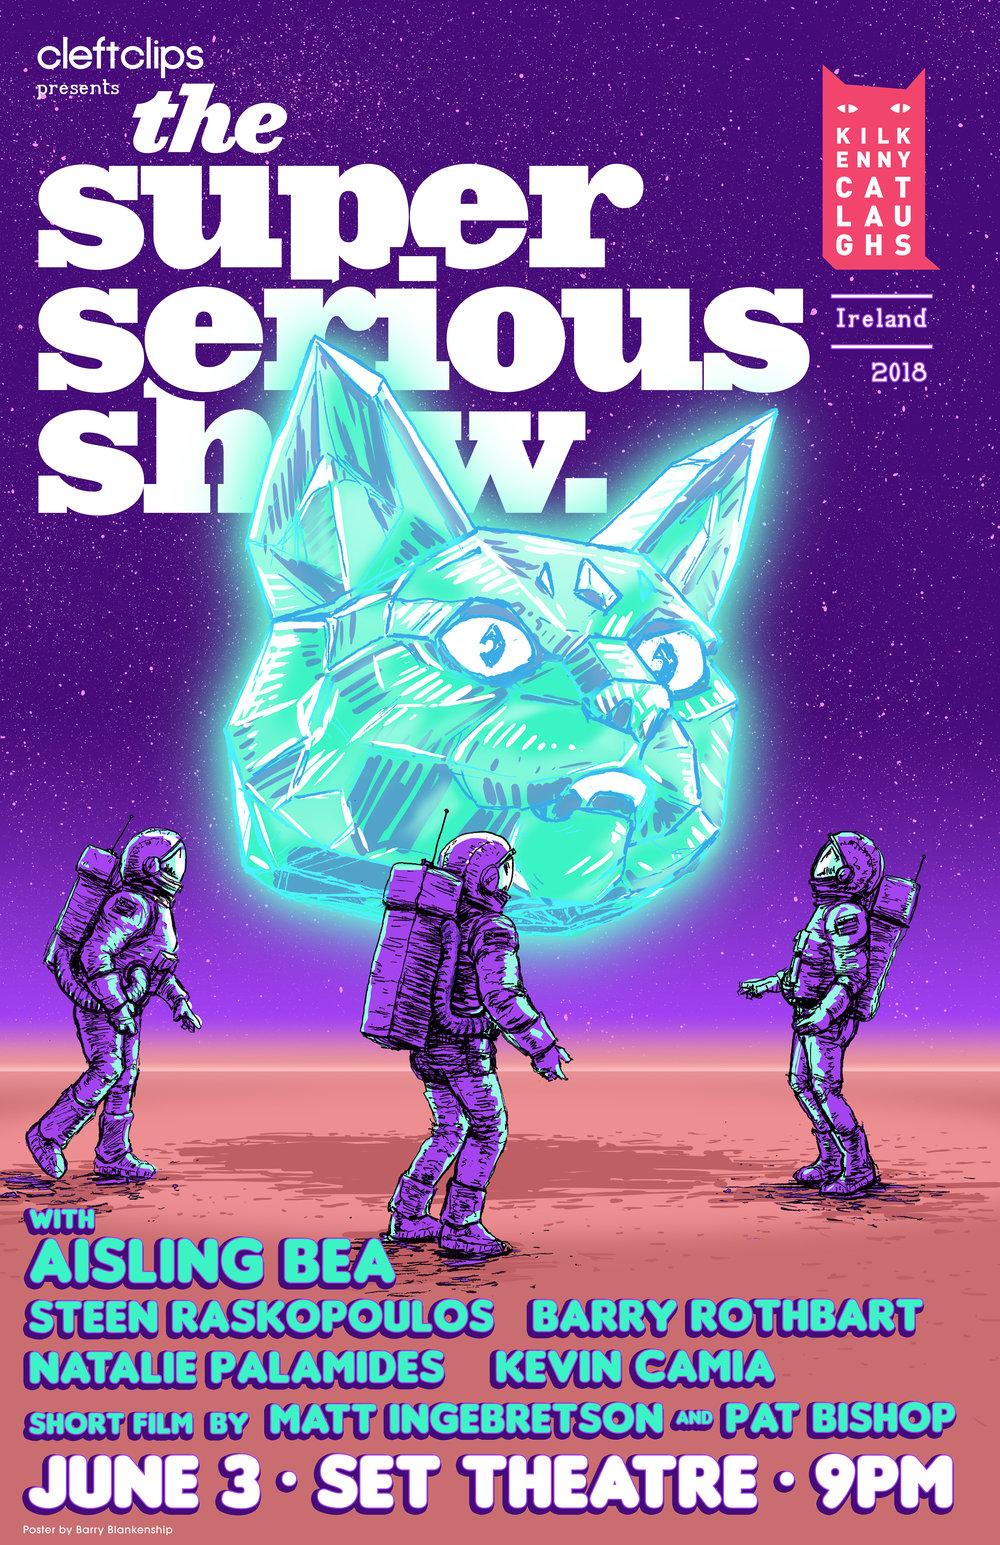 super_serious_cat_poster.jpg